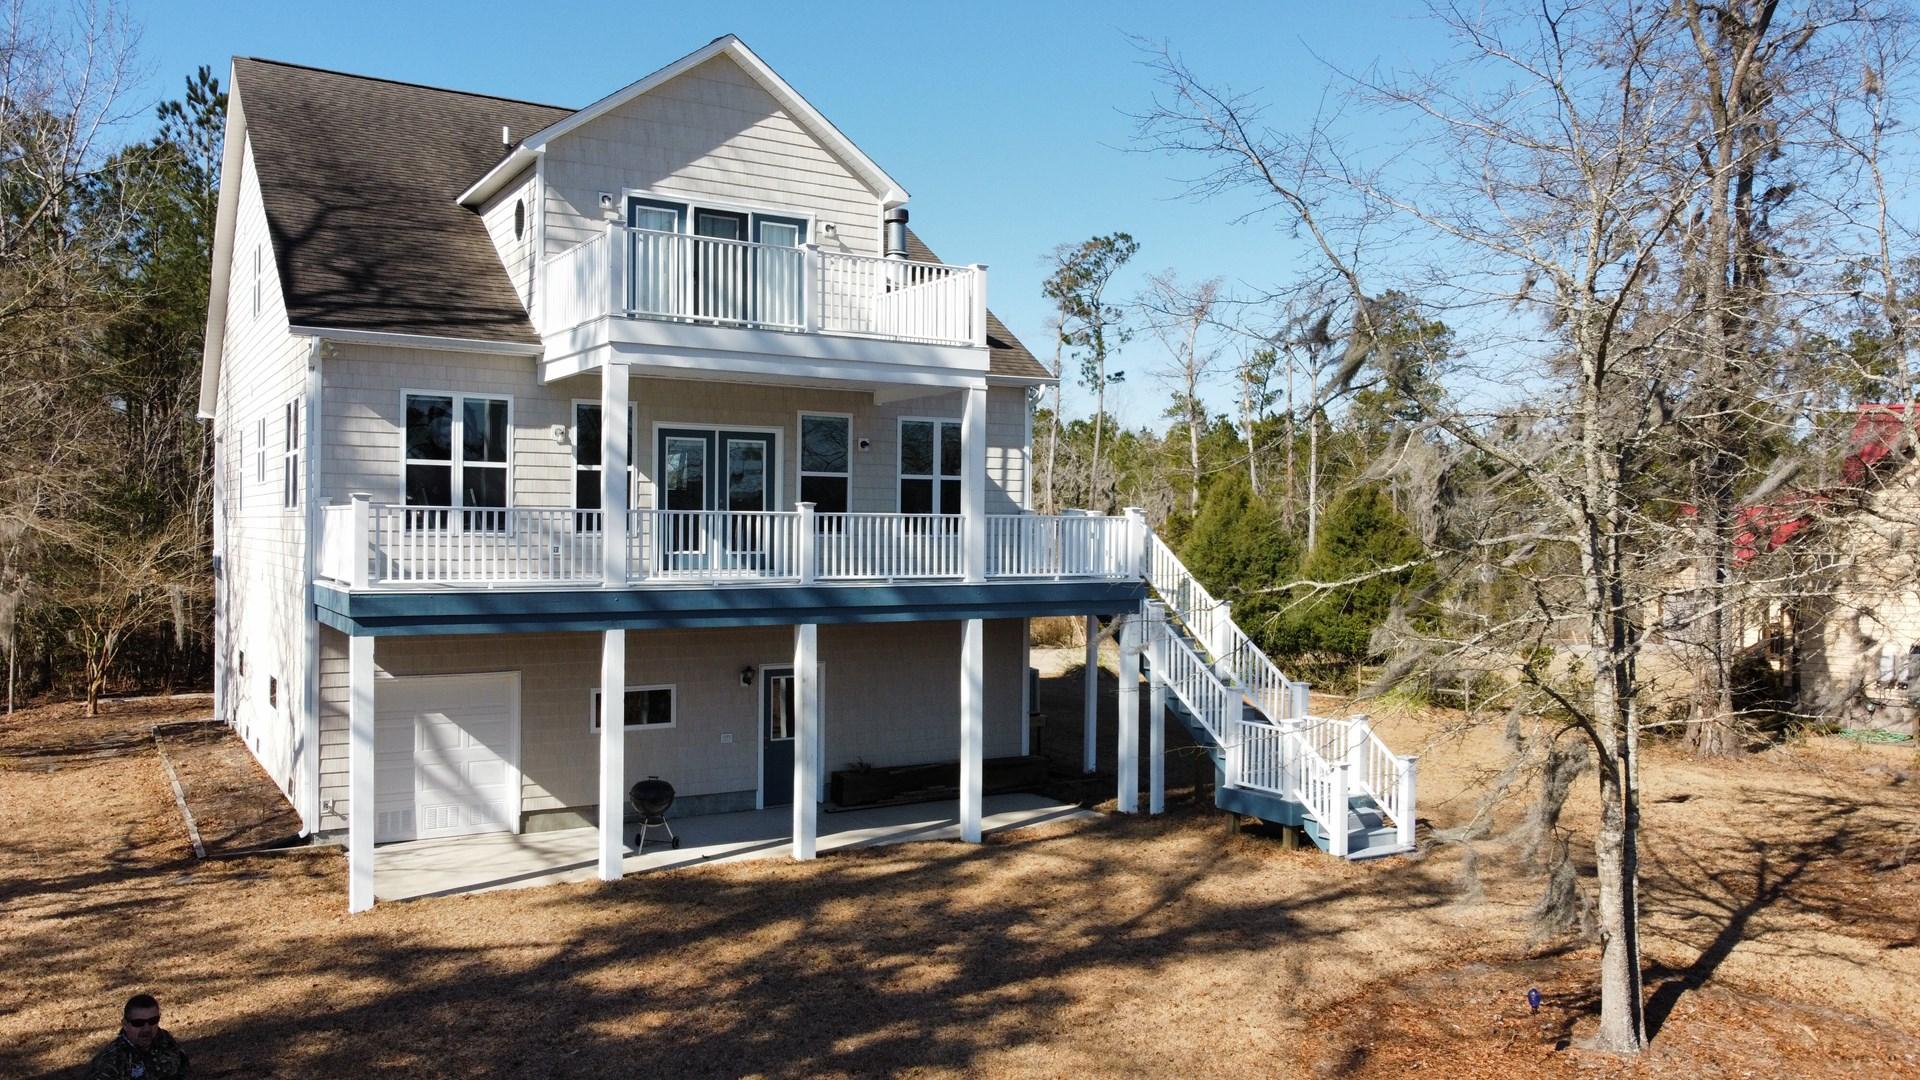 Waterfront home in Coastal North Carolina